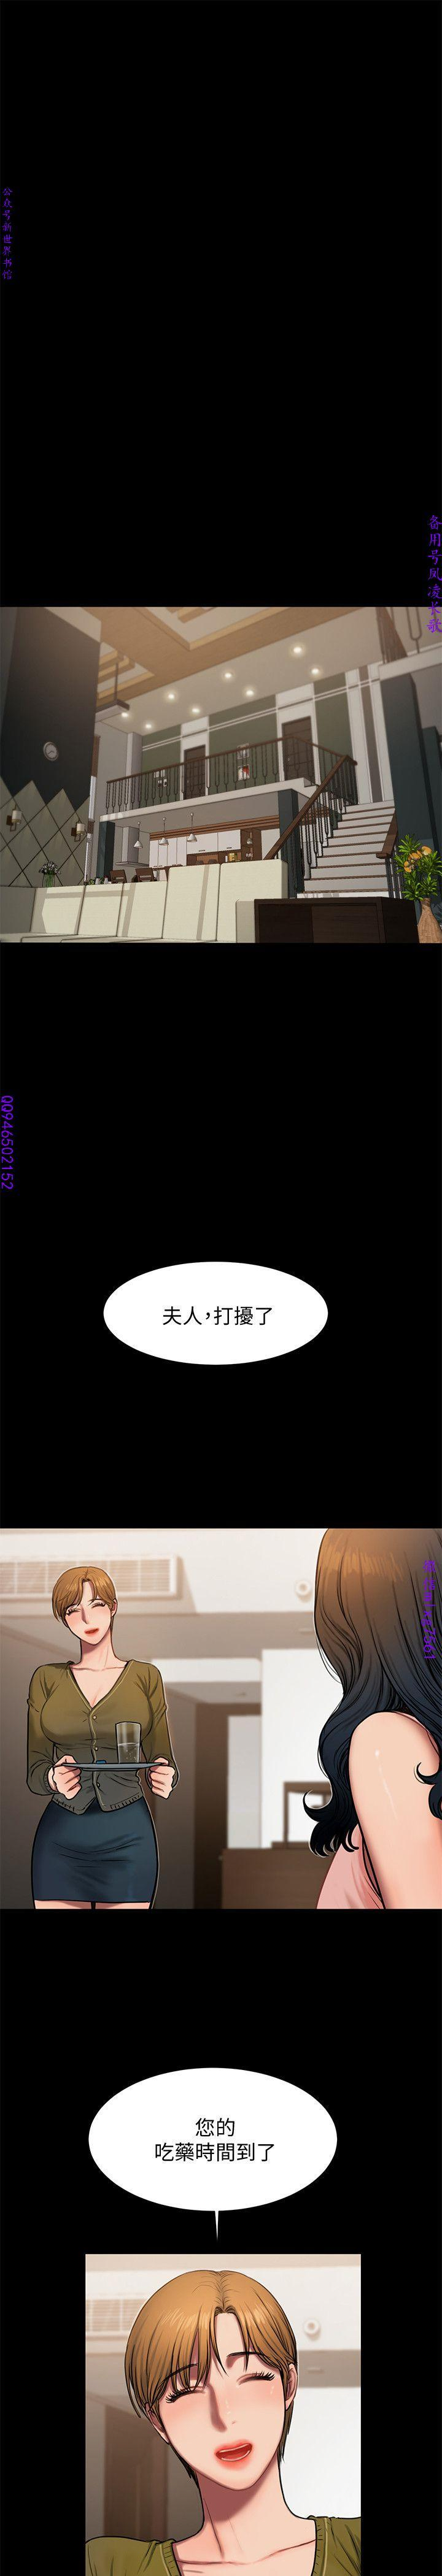 Run away 1-10【中文】 192